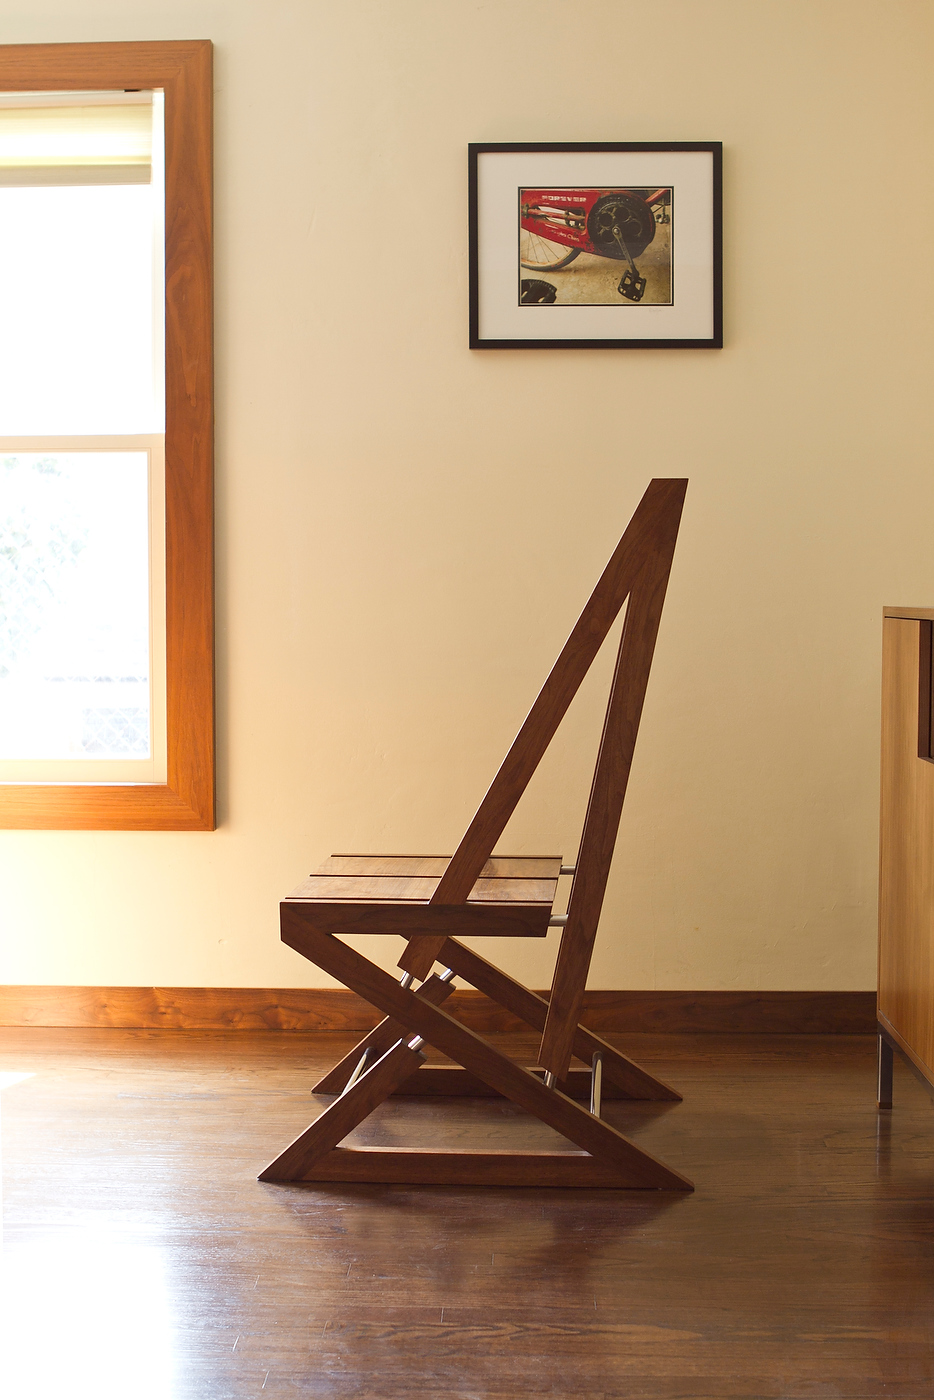 furniture-chair-thing-01.jpg